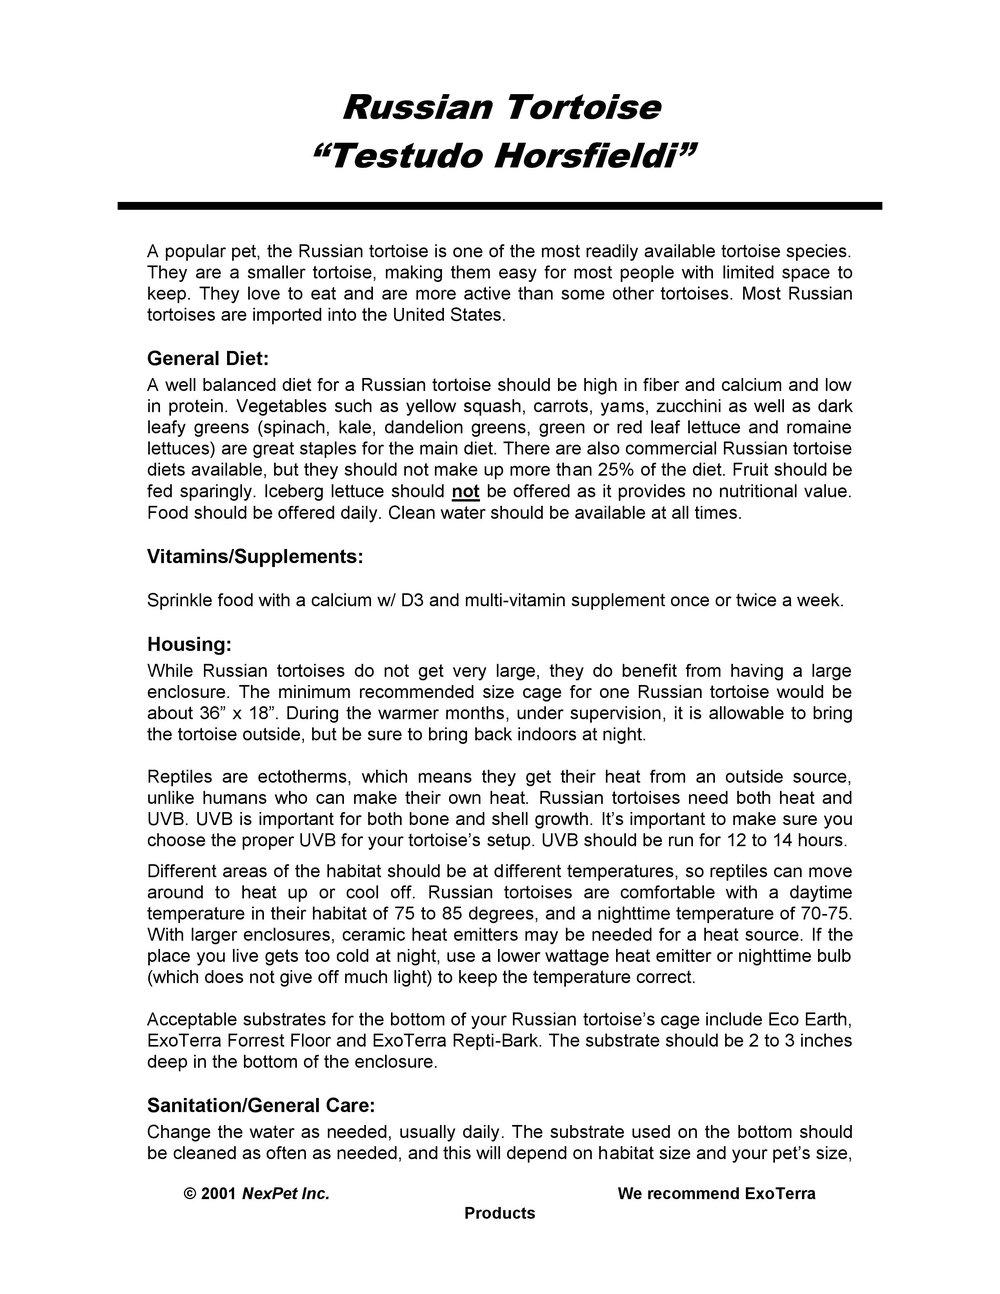 Russian Tortoise Care Sheet pg1